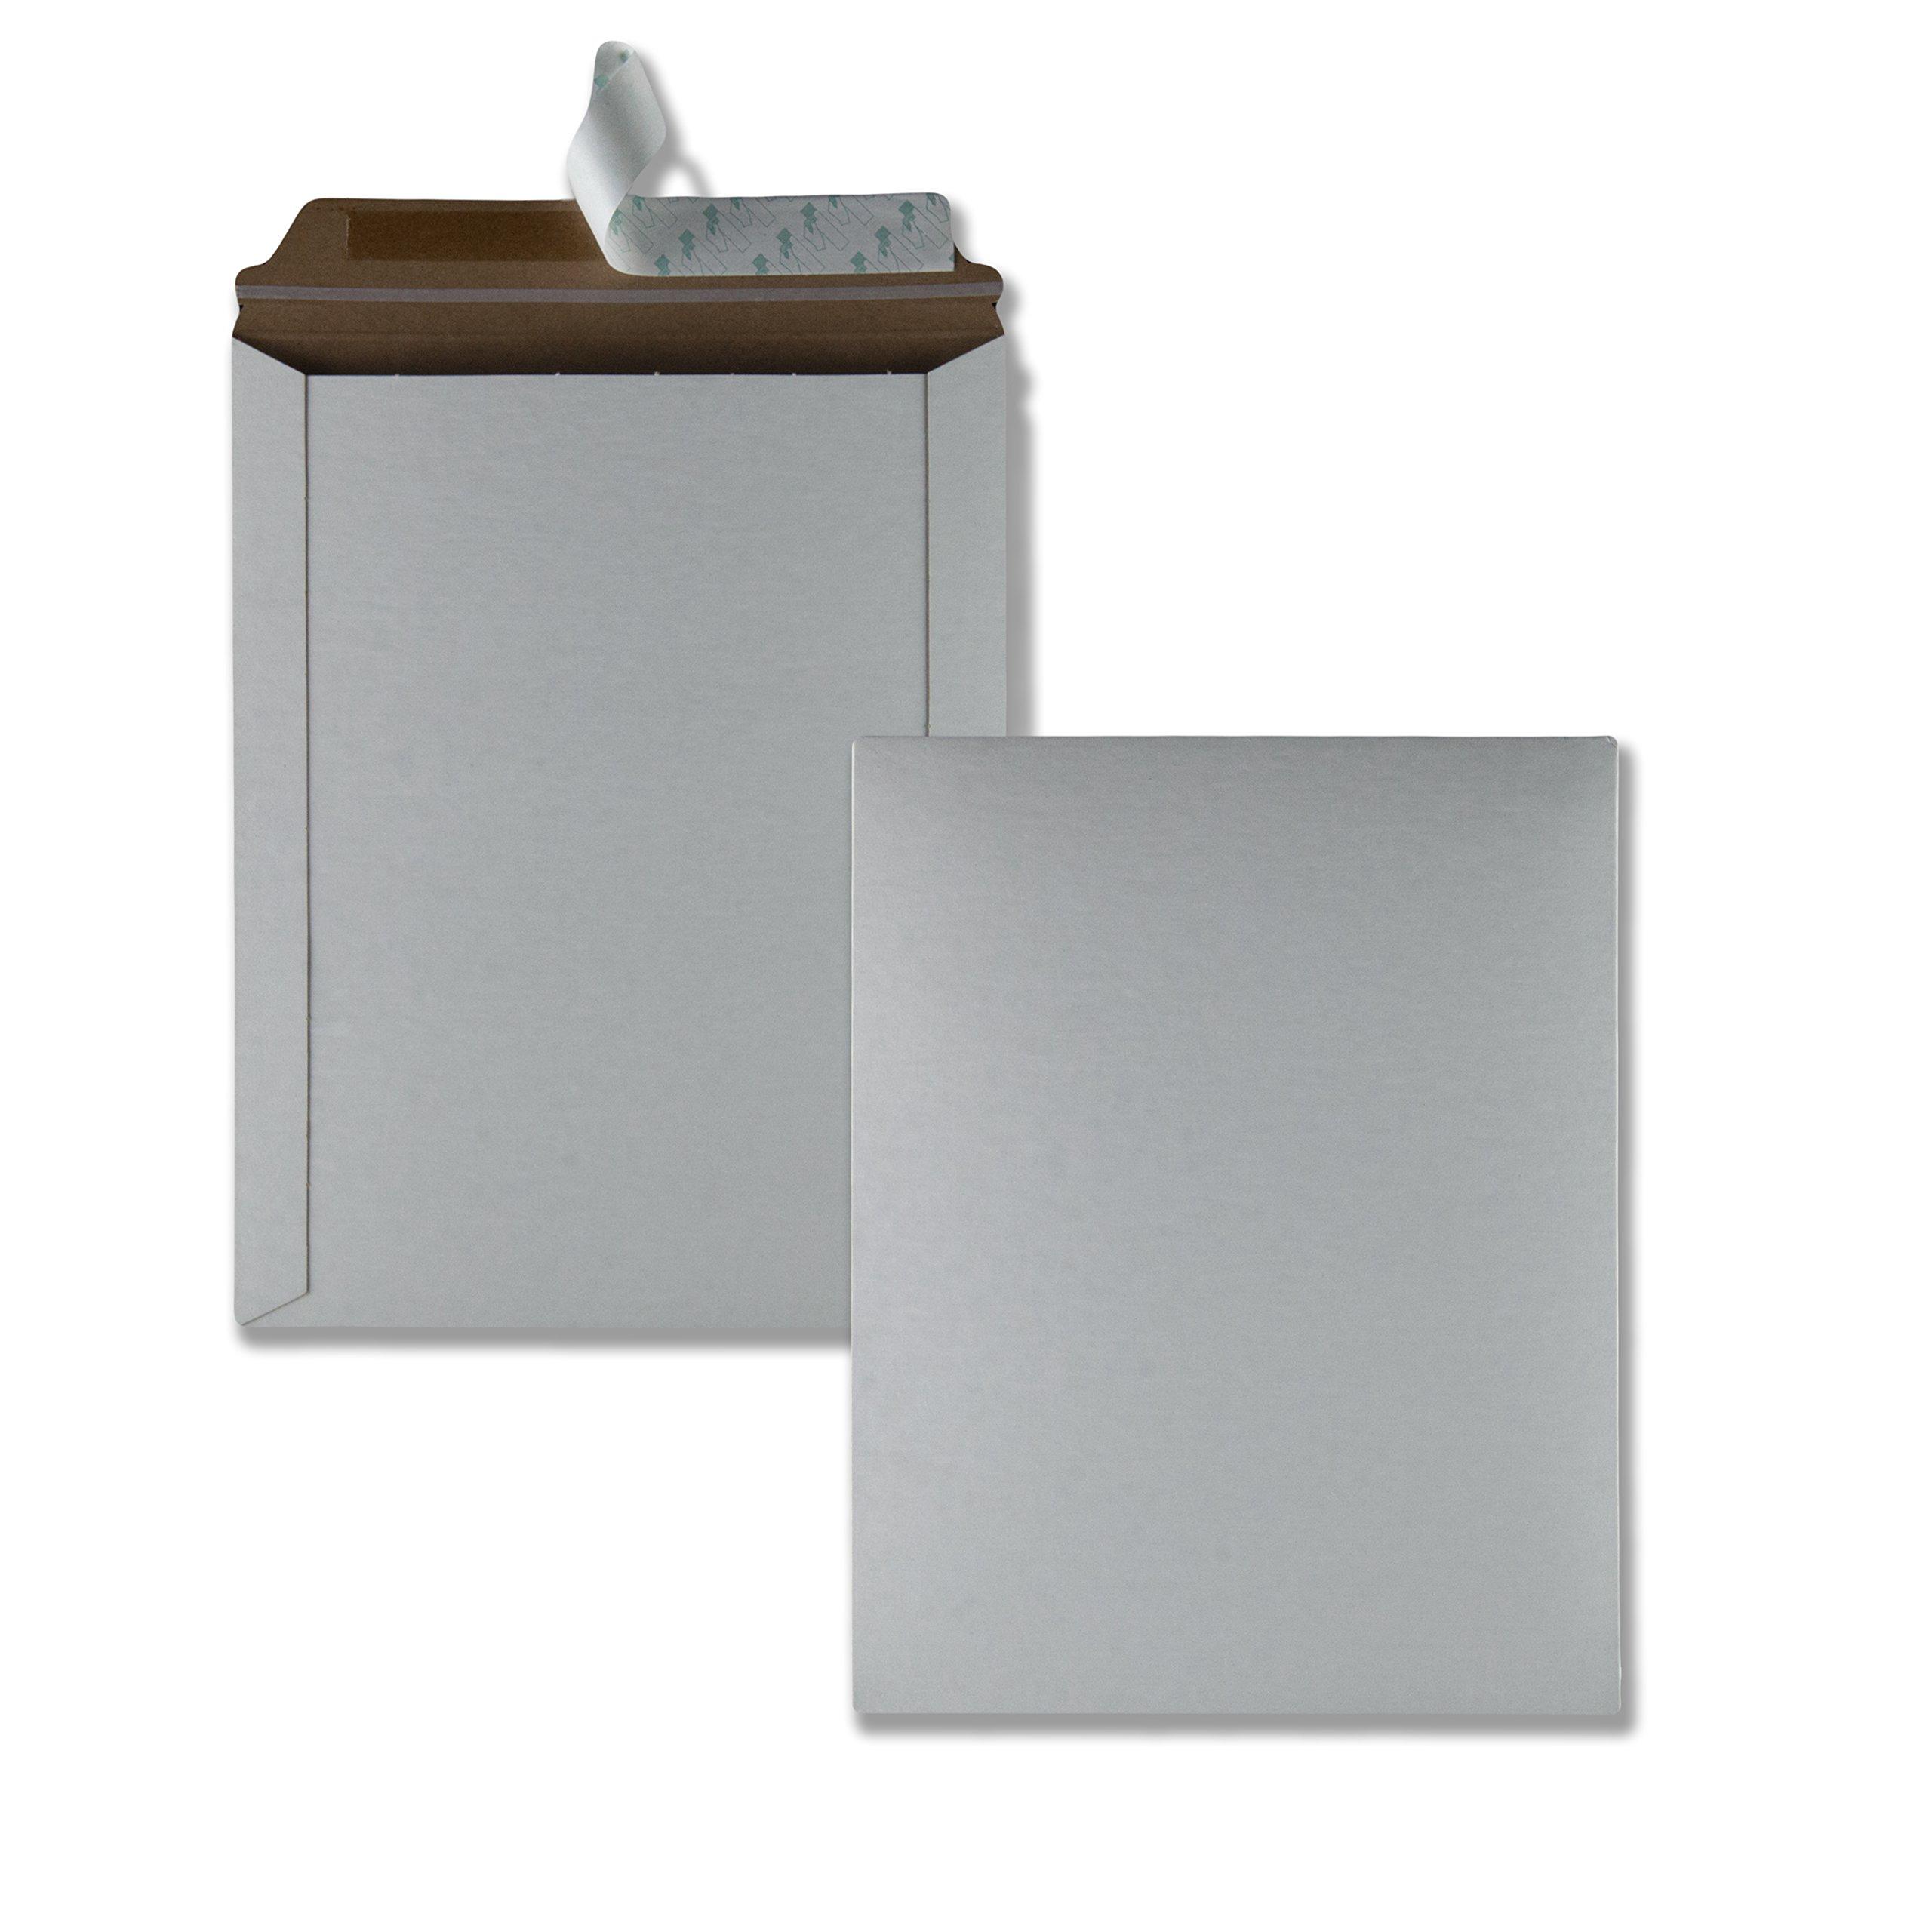 Quality Park 64015 Photo/Document Mailer, Redi Strip, 9 3/4 x 12 1/2, White (Box of 25)